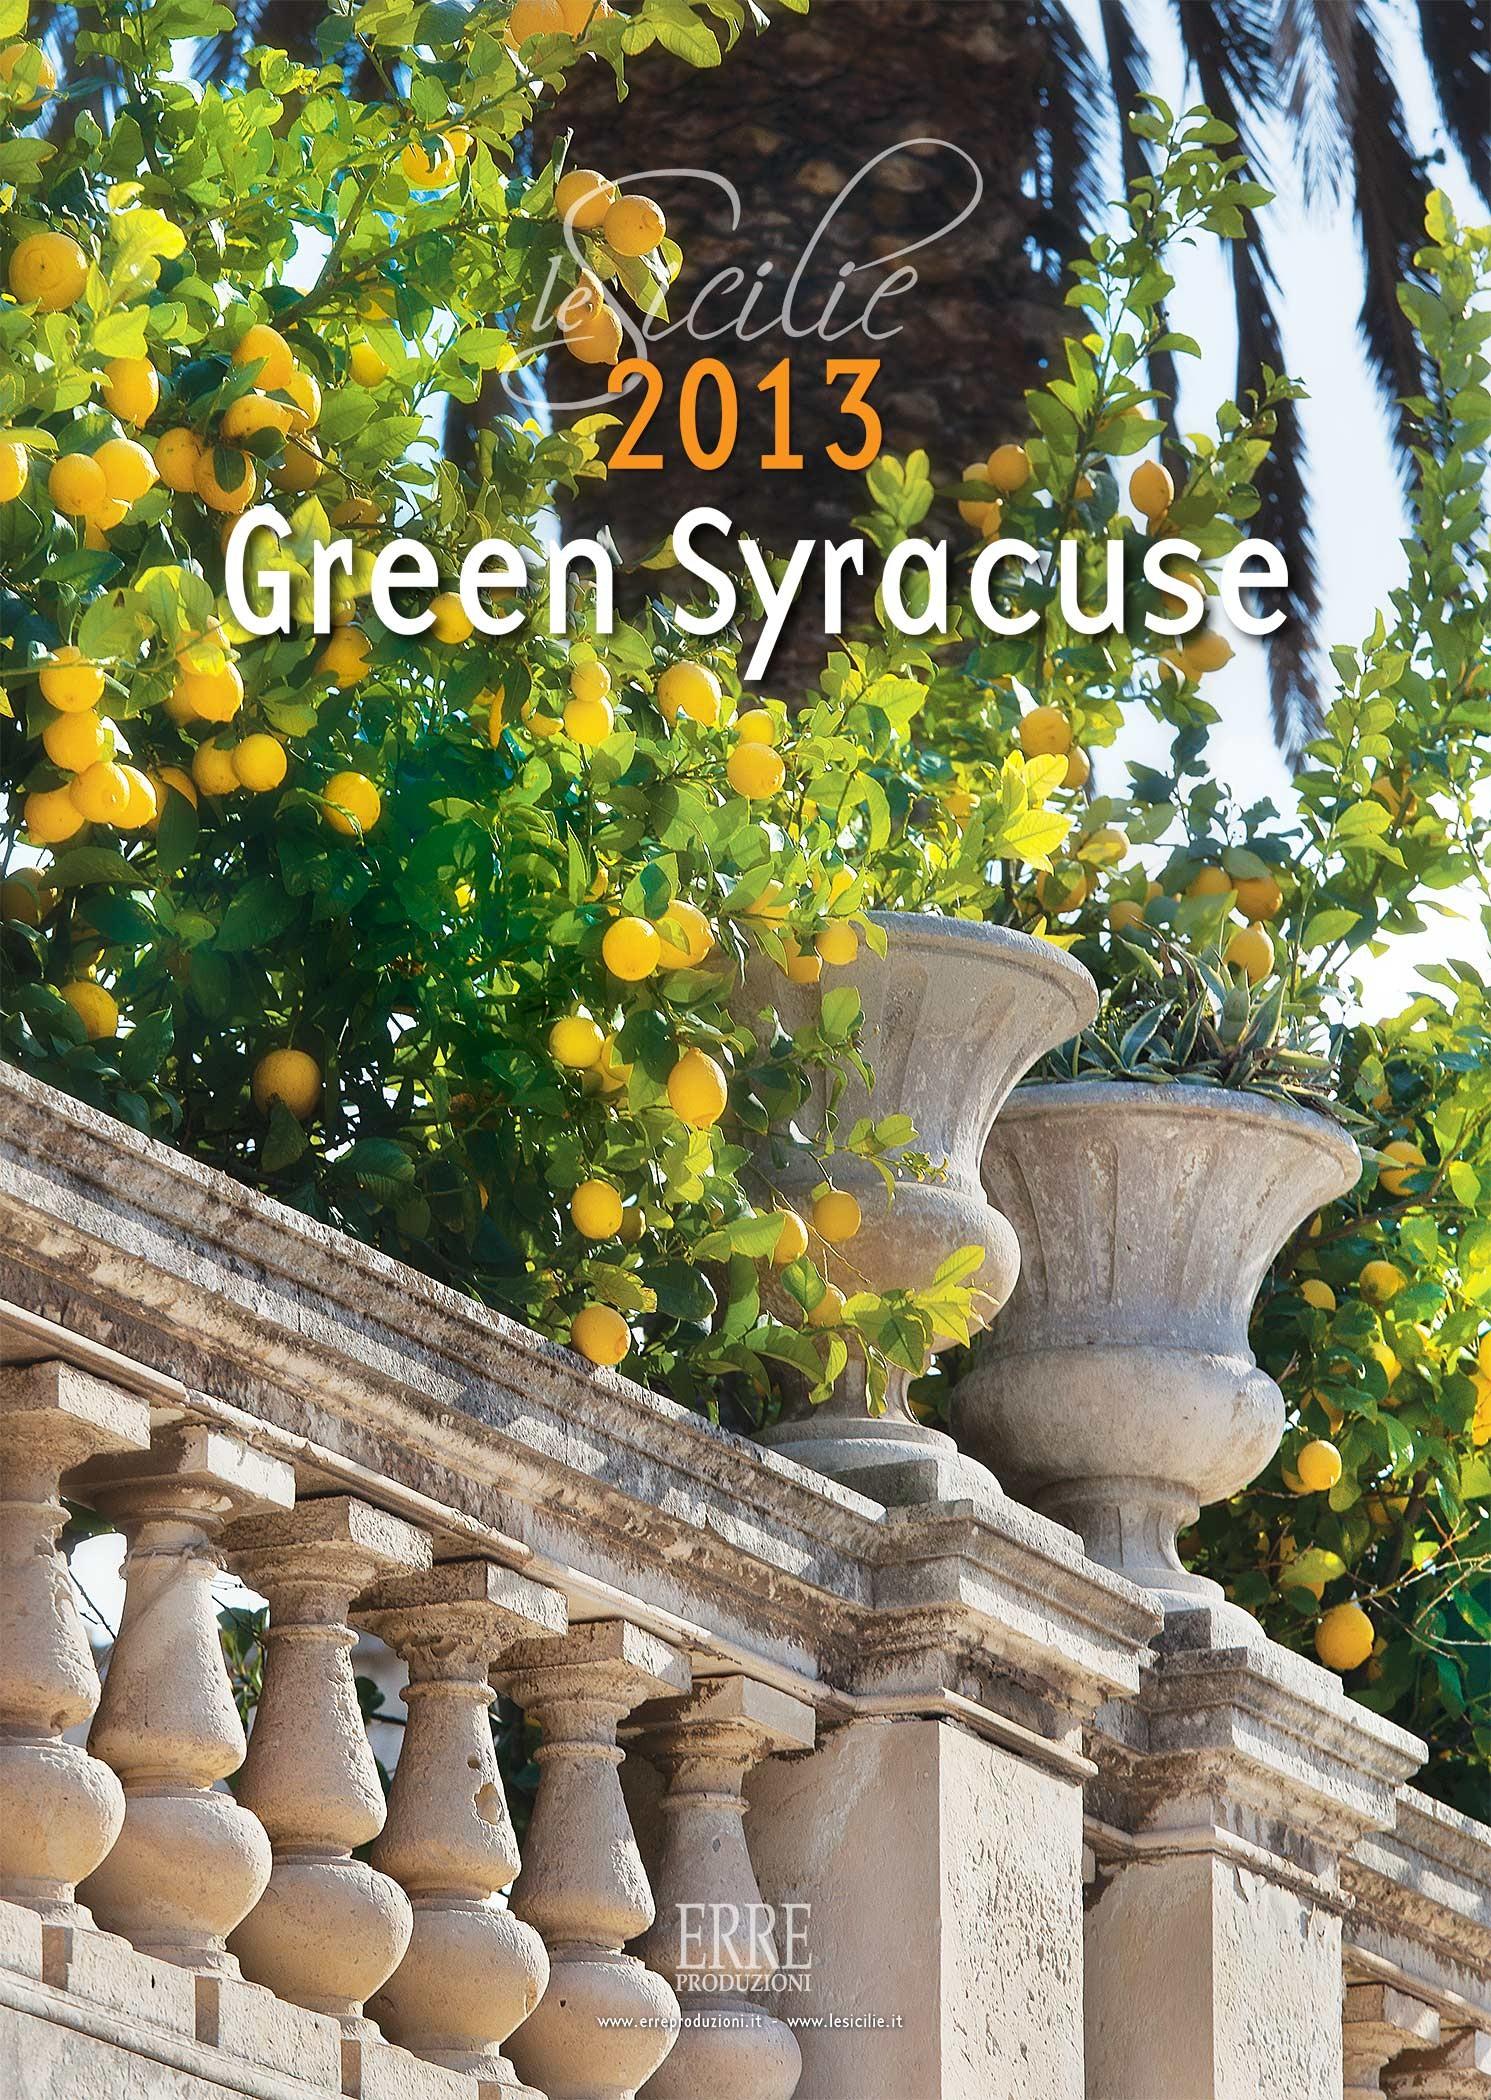 Green Syracuse - art calendar2013